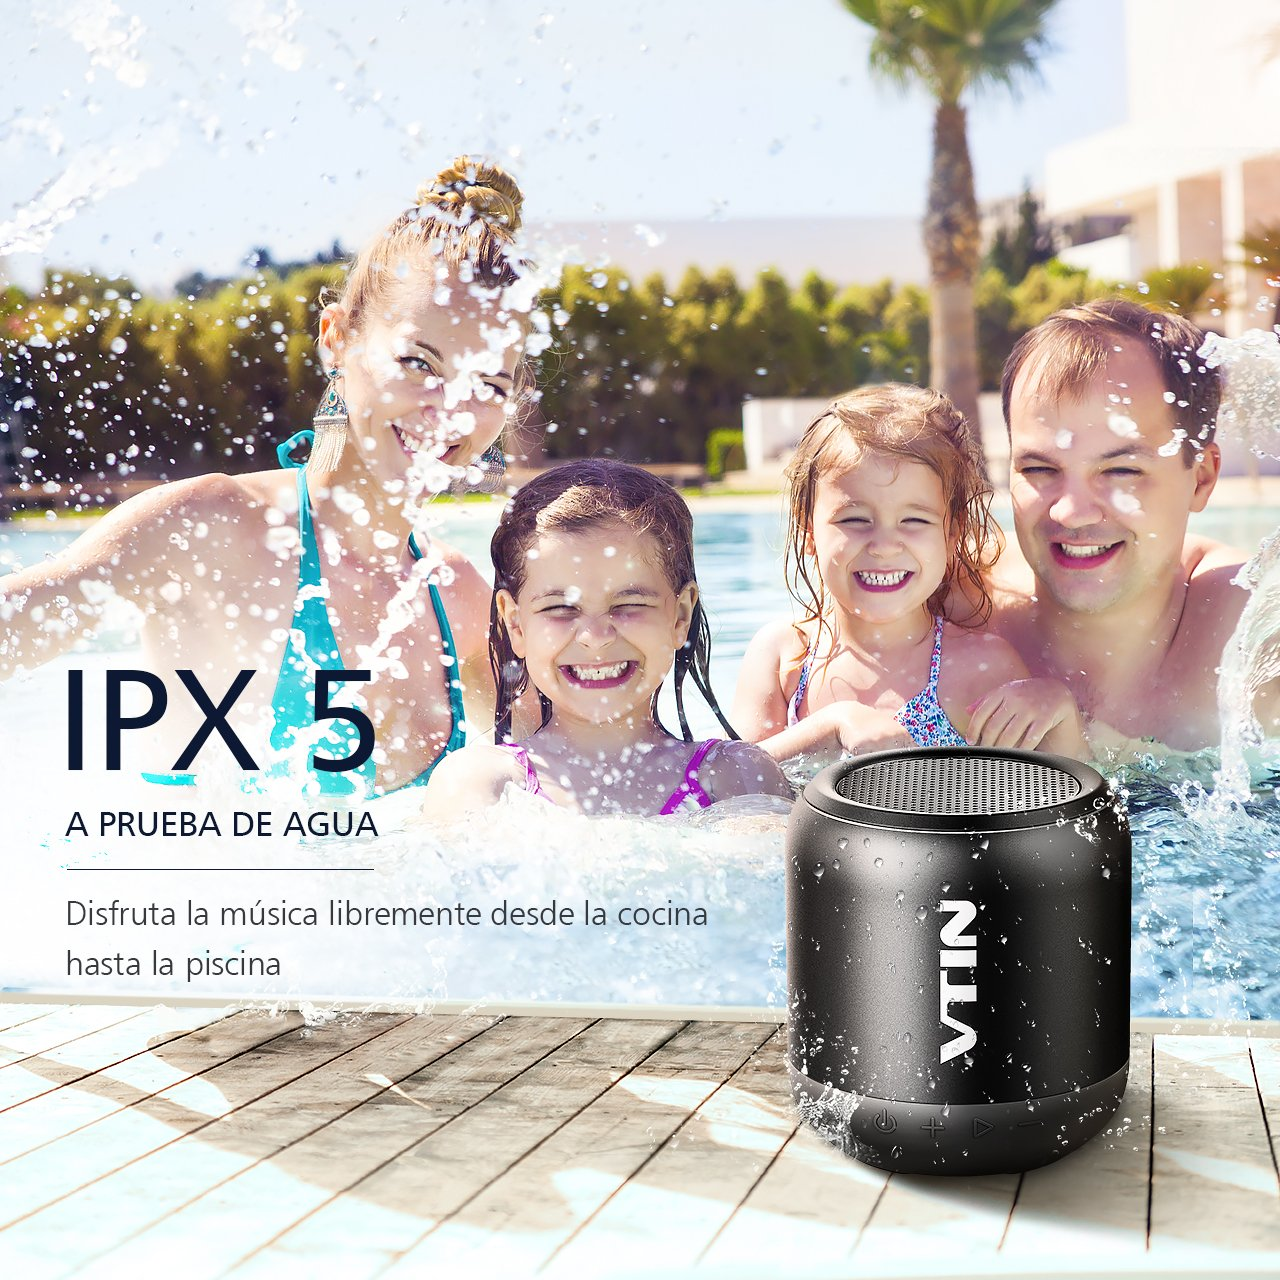 Amazon.com: Vtin IPX5 Altavoz Bluetooth Extra-Portatil Impermeable con Graves Mejorados: Electronics